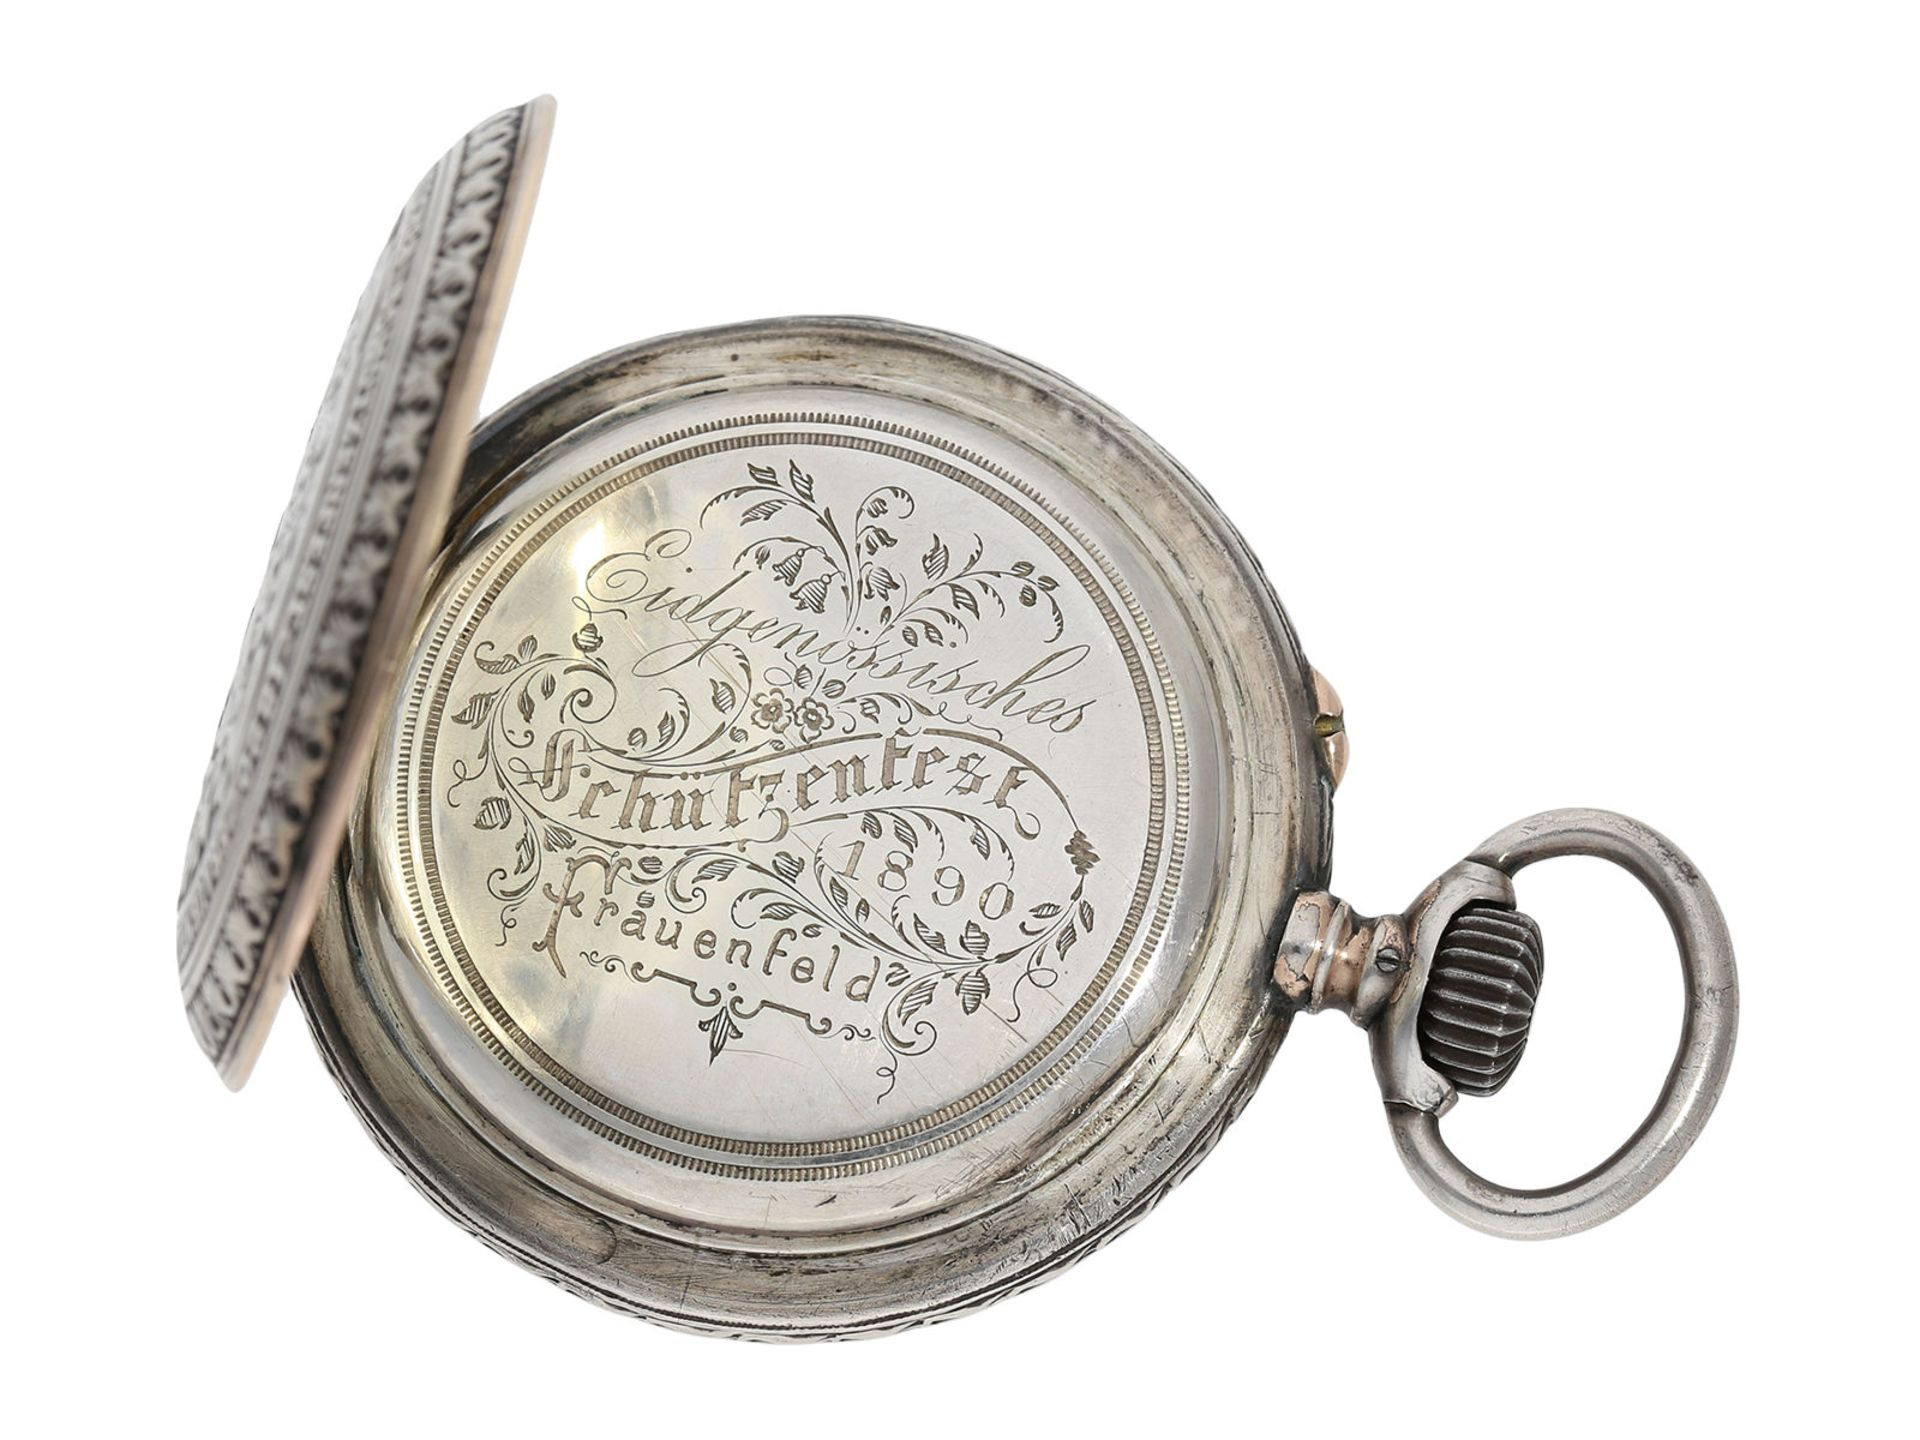 Pocket watch: large IWC marksman's watch, Federal Shooting Festival Frauenfeld 1890 - Bild 2 aus 6